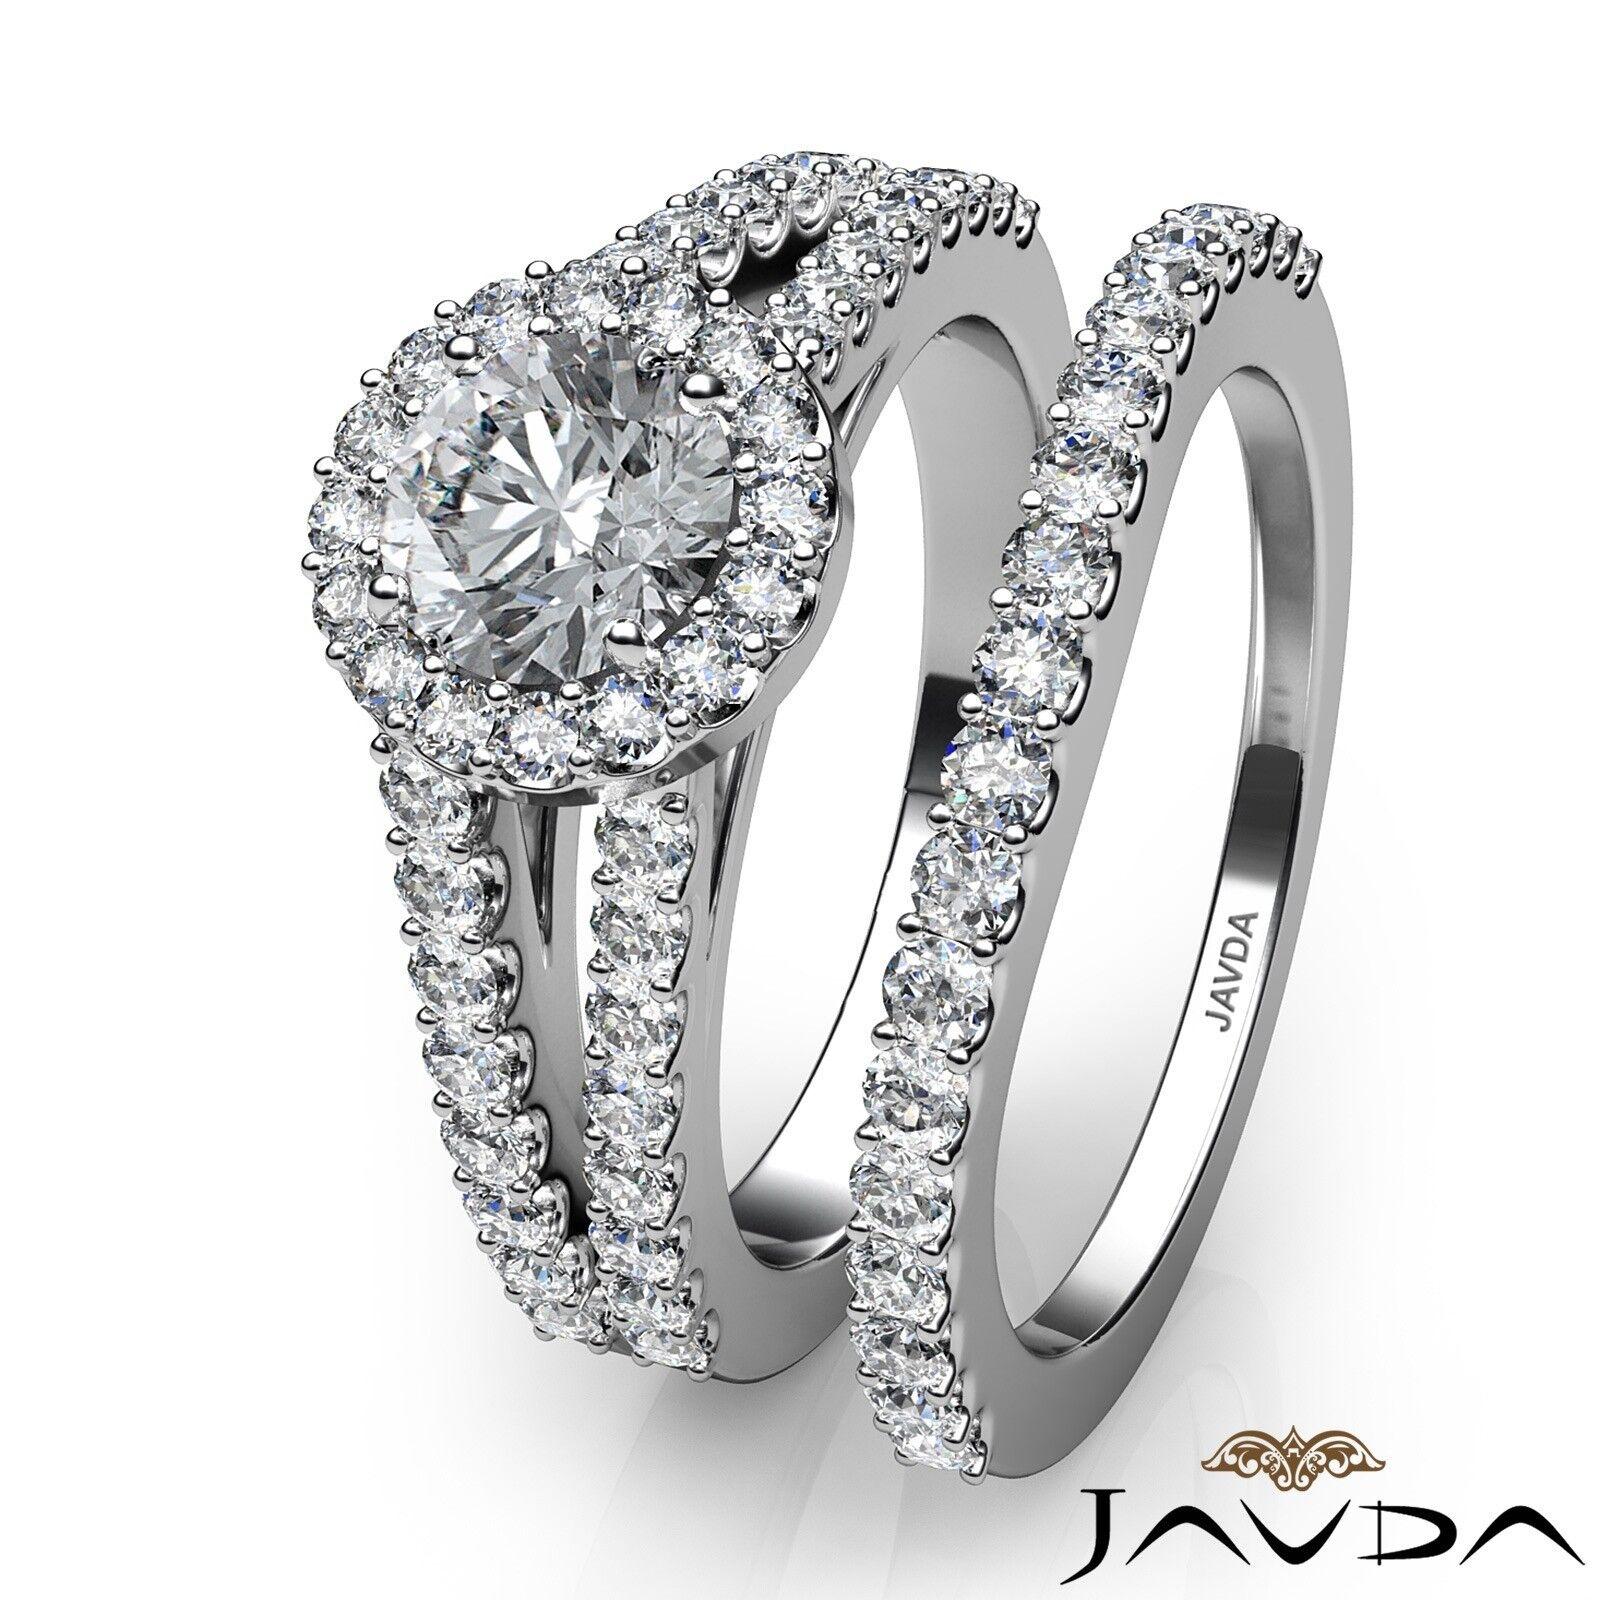 1.85ctw Luxurious Wedding Bridal Round Diamond Engagement Ring GIA G-VVS1 W Gold 3